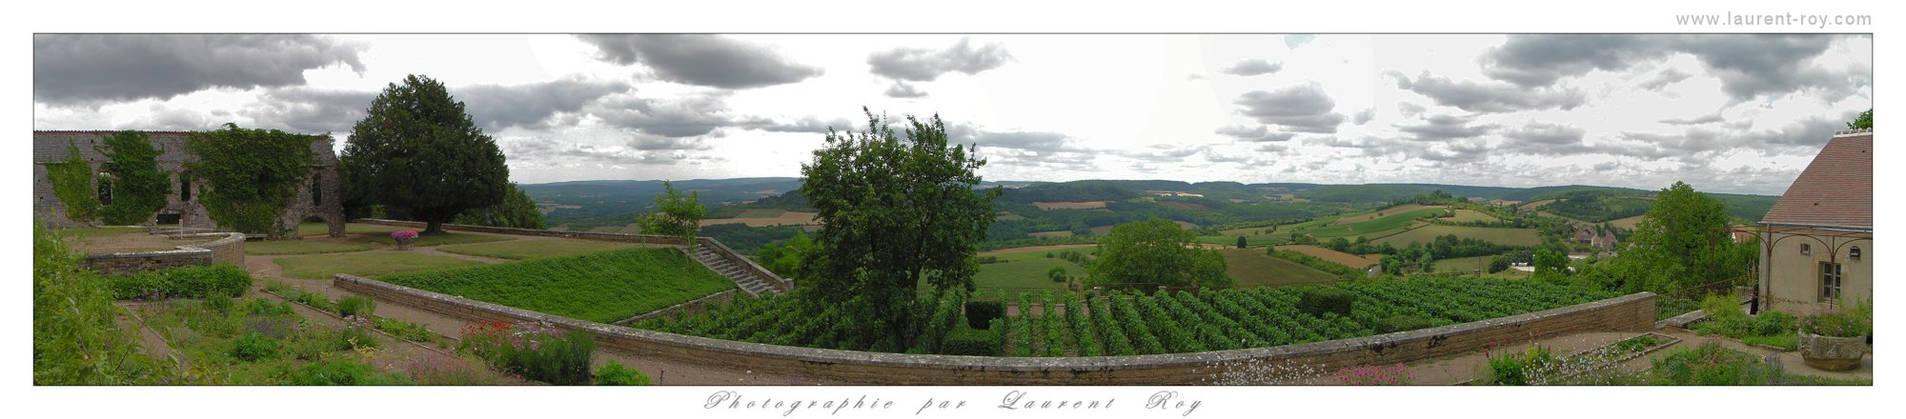 Vezelay - 006